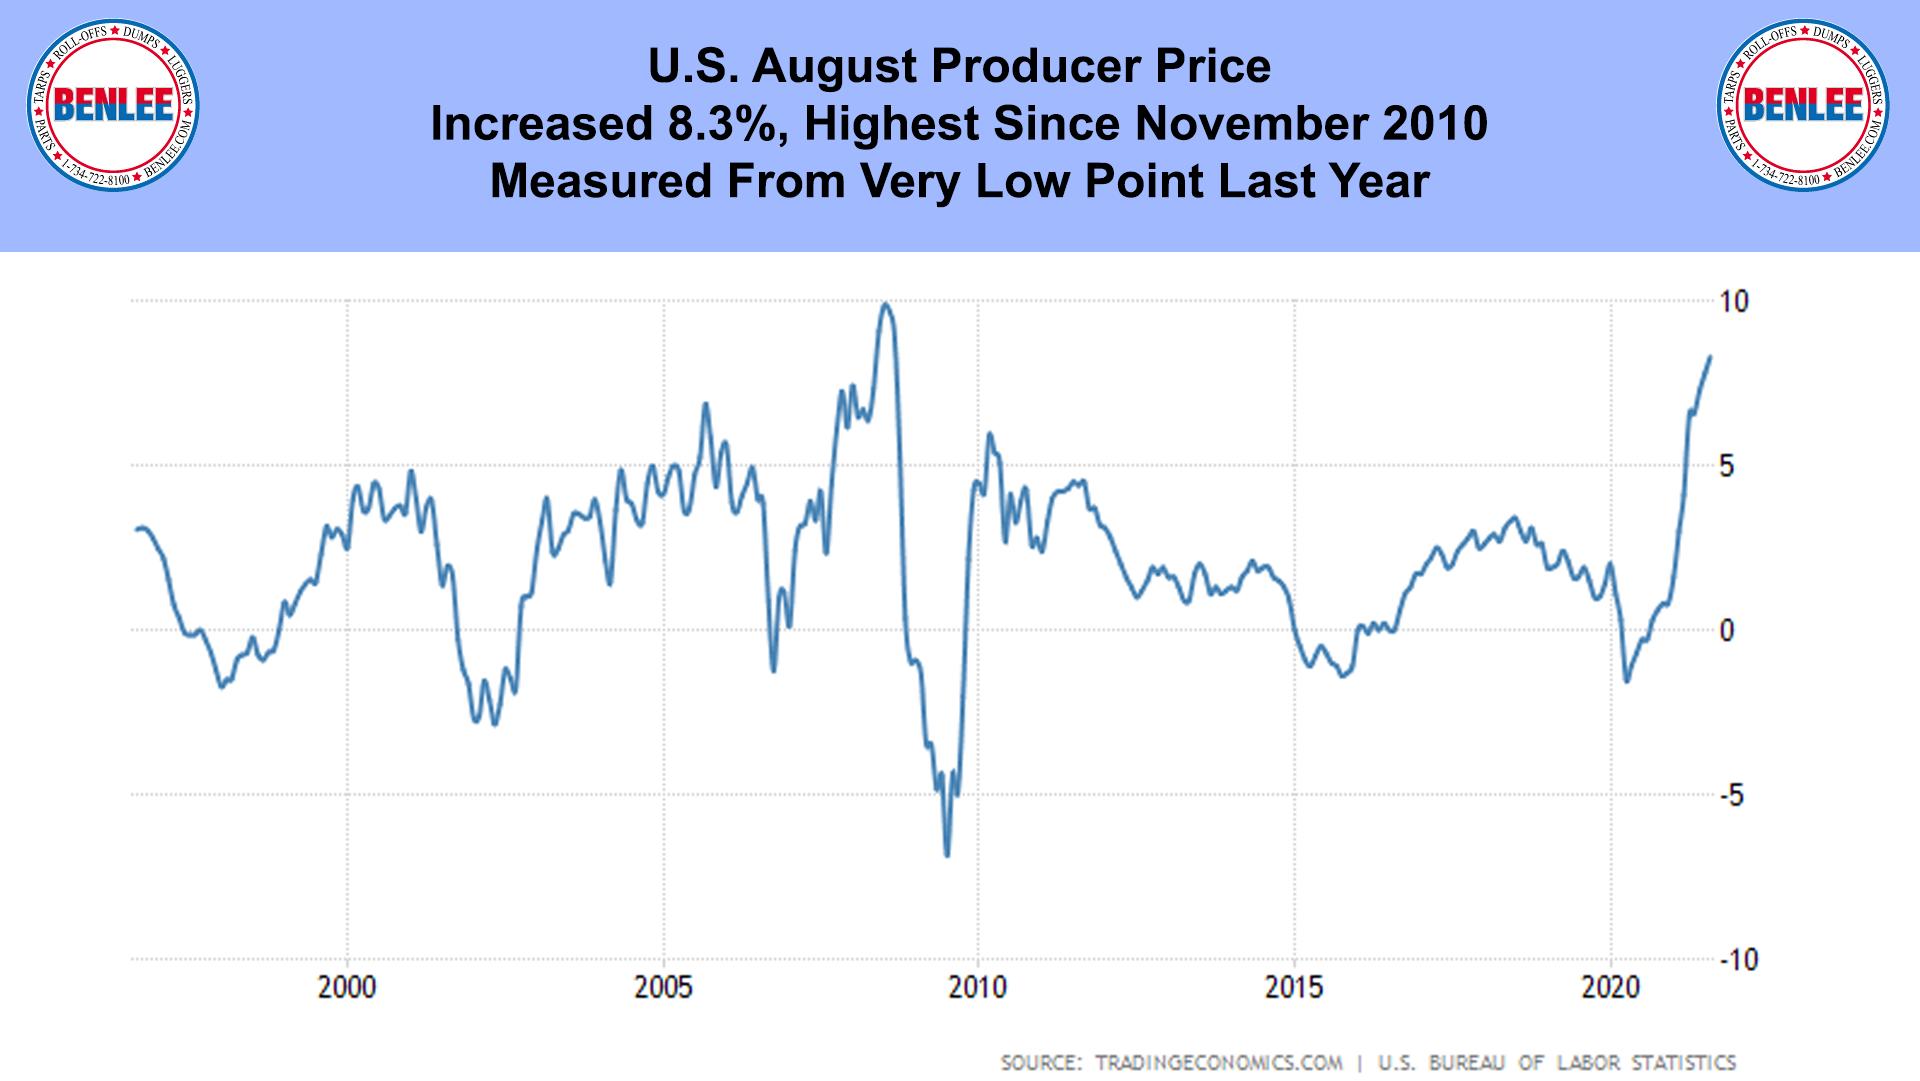 U.S. August Producer Price